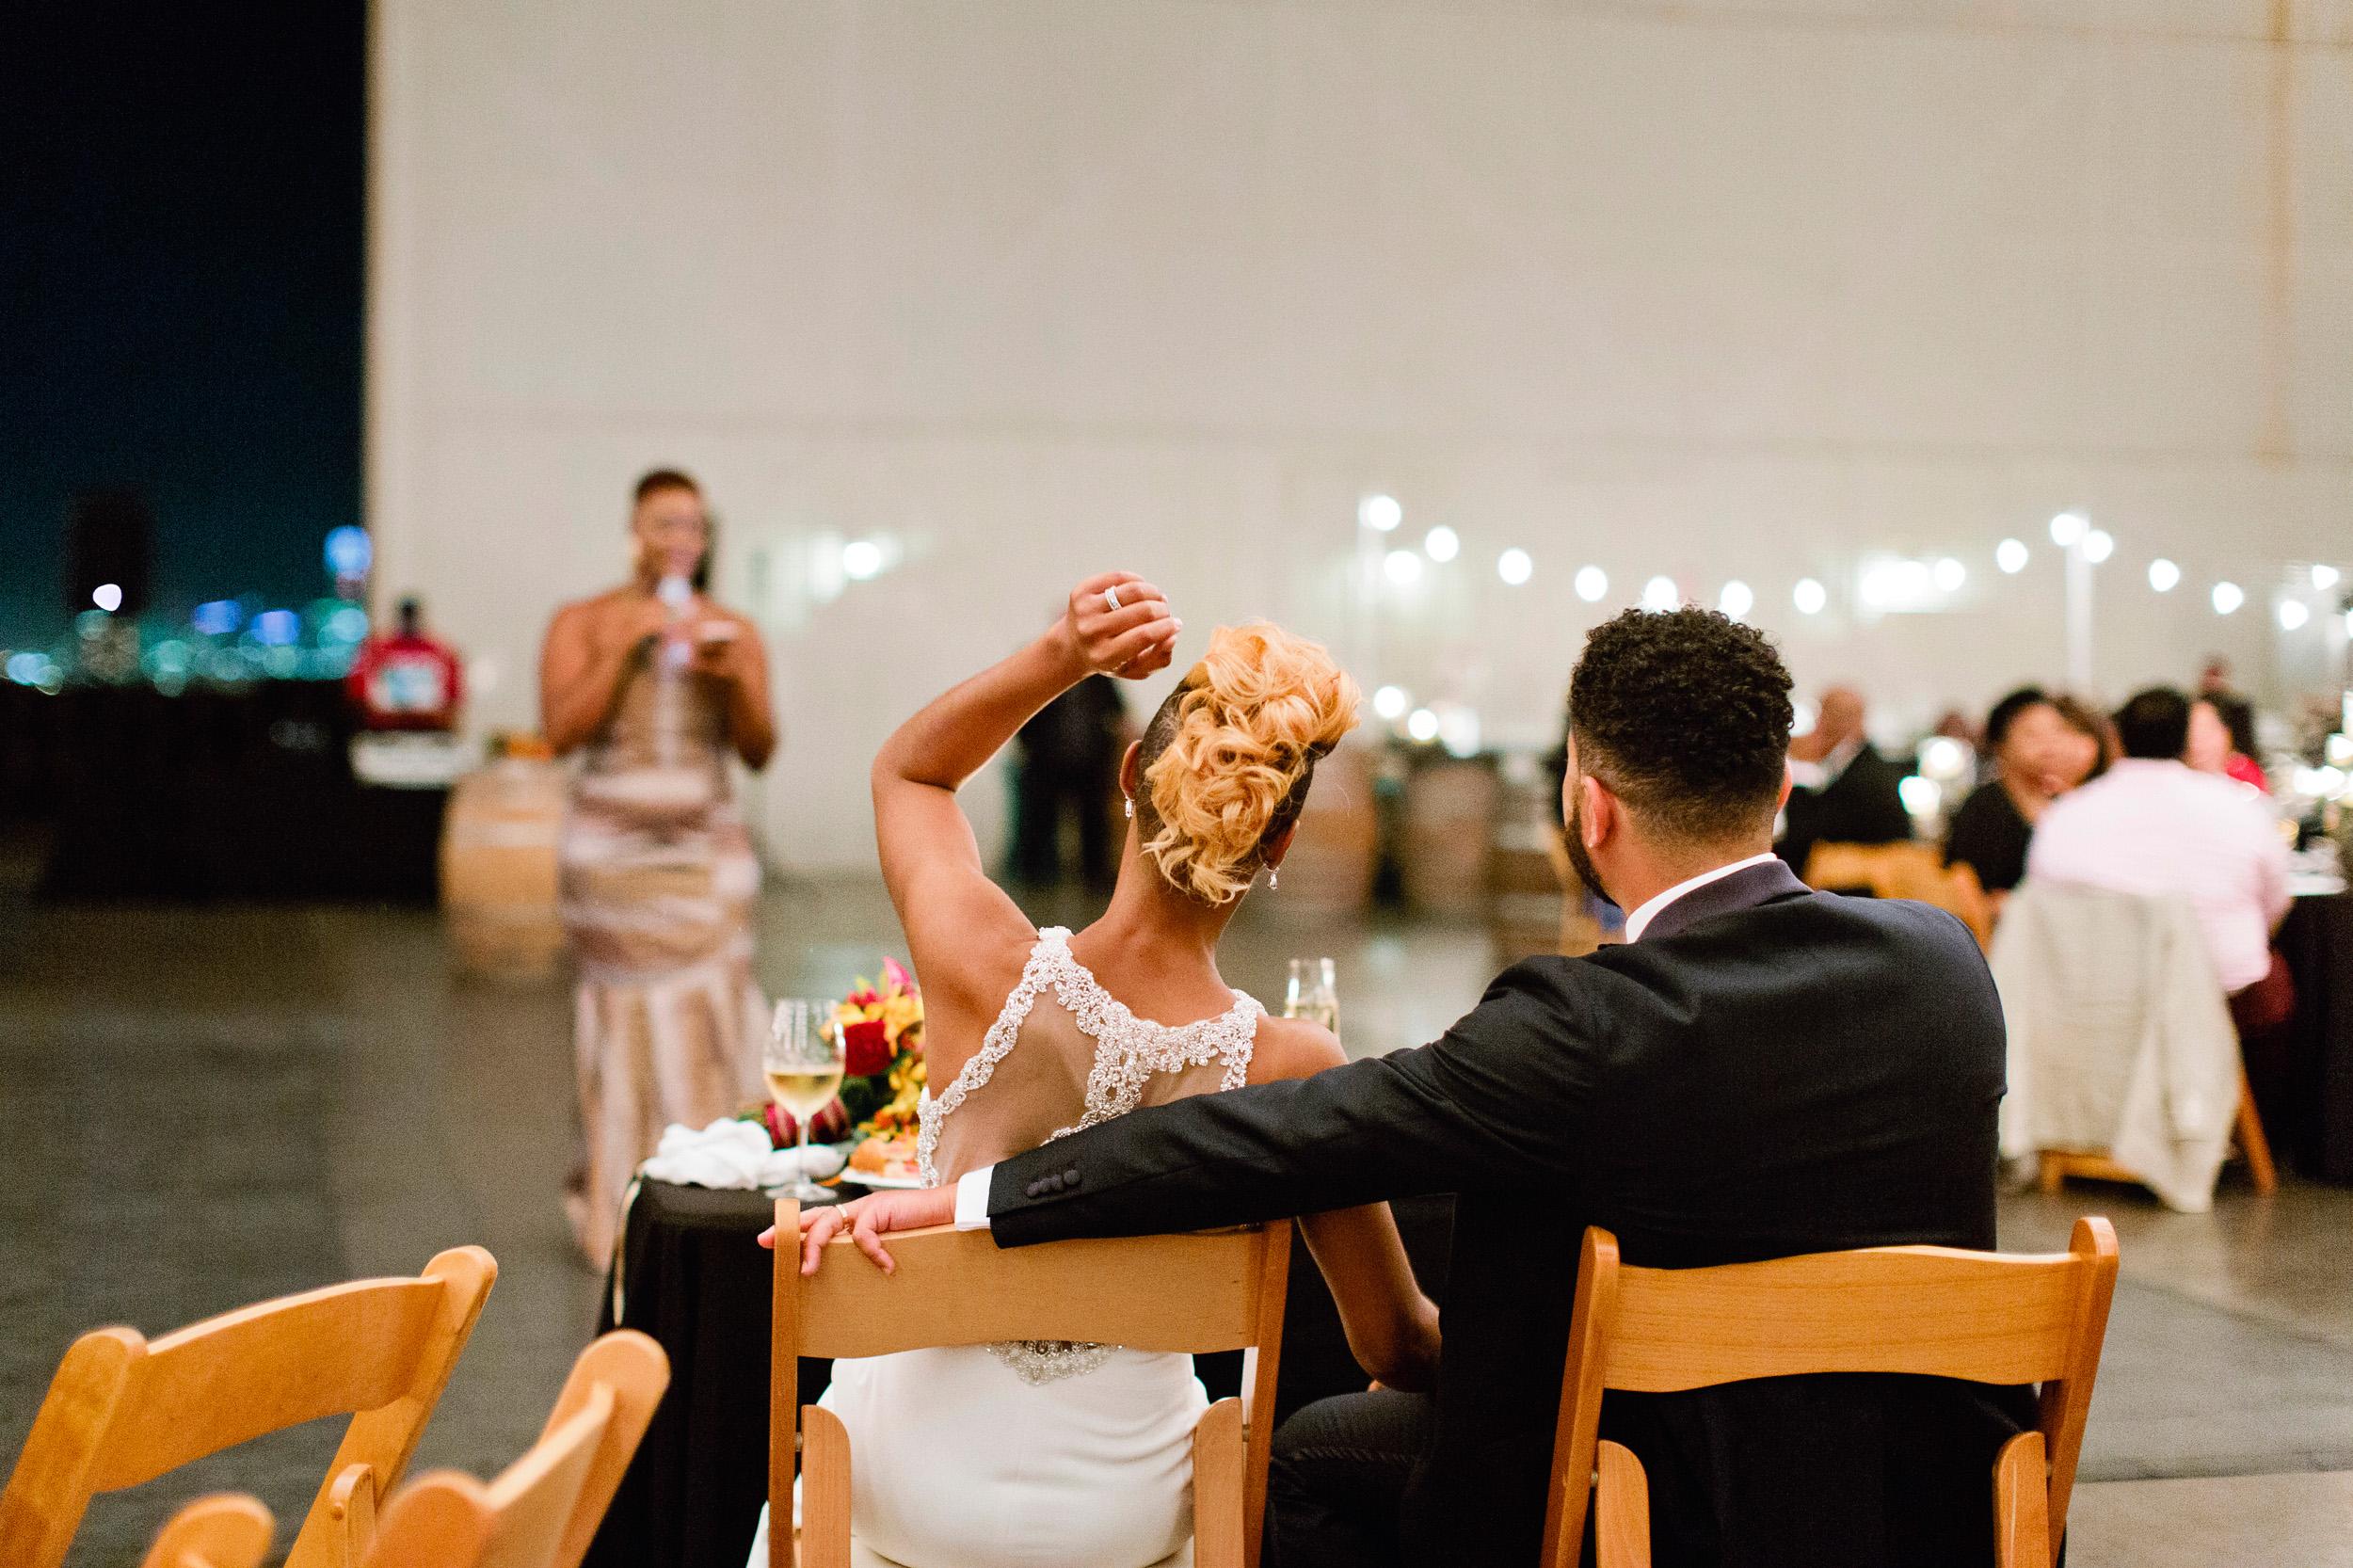 Alameda-Rockwall-Winery-Wedding-049.JPG